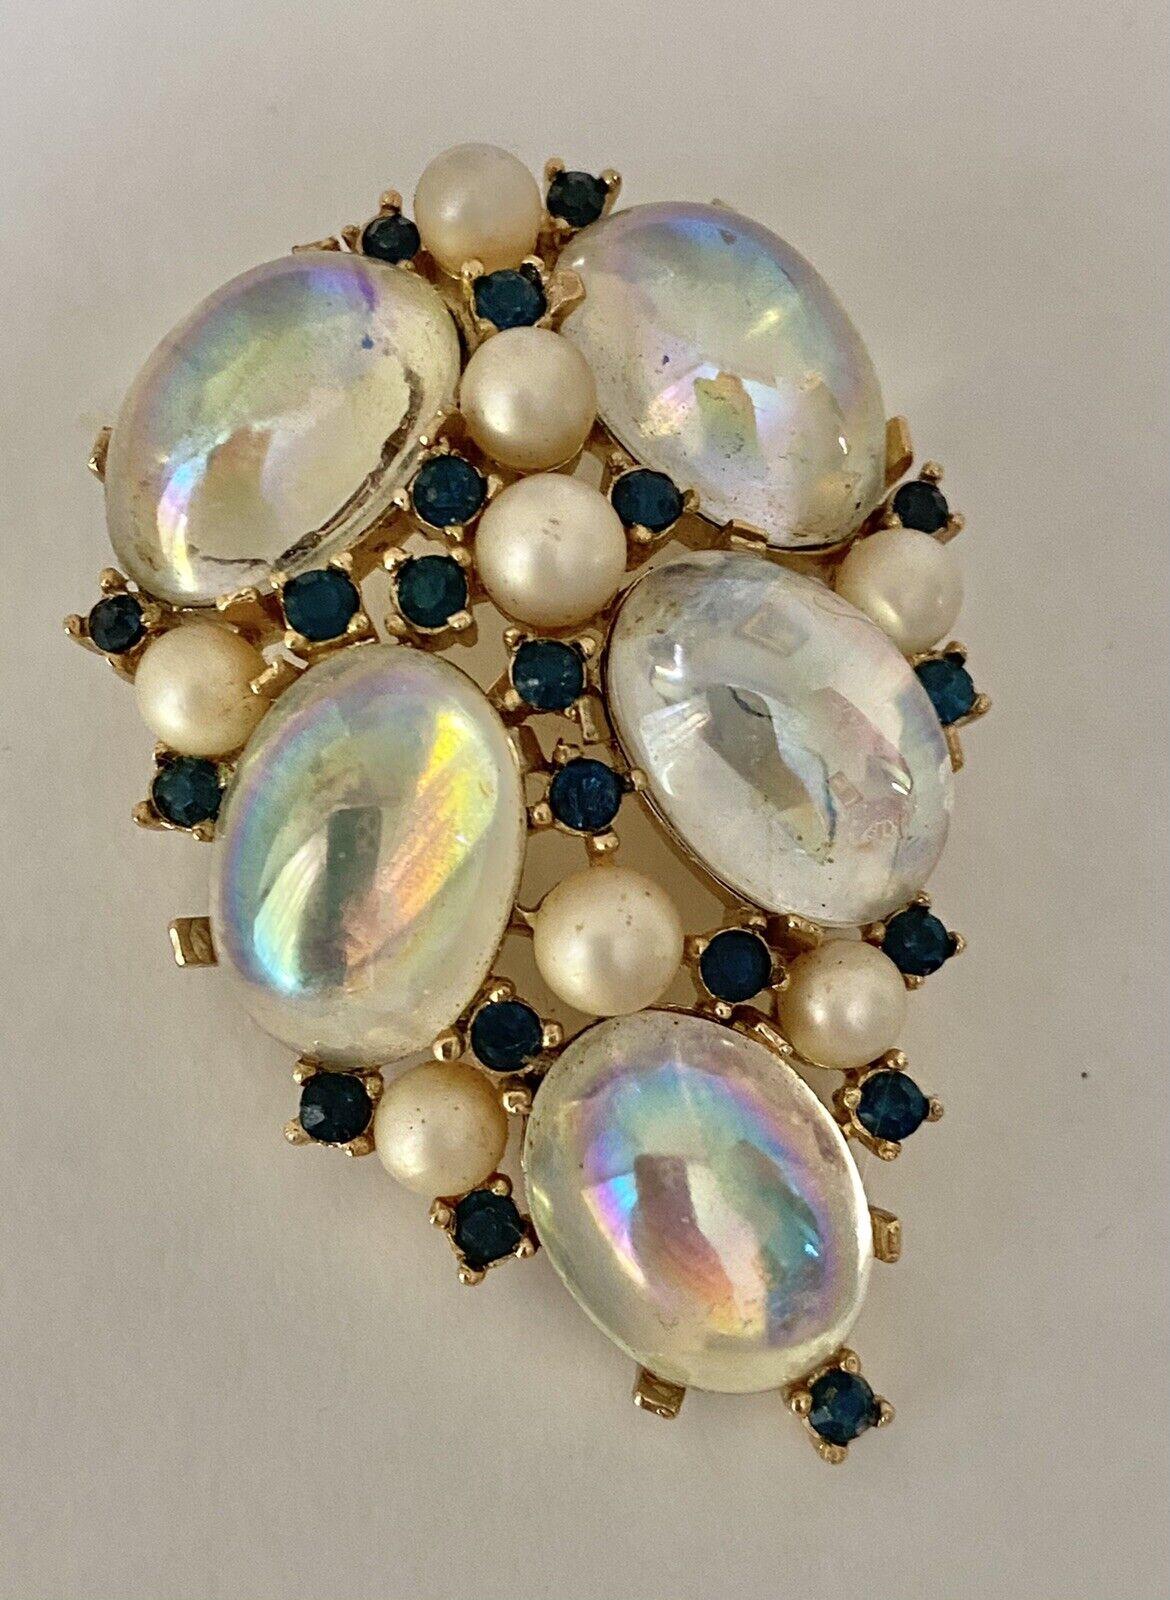 Trifari Sapphire & Pearl Brooch 1950s/60s - image 1